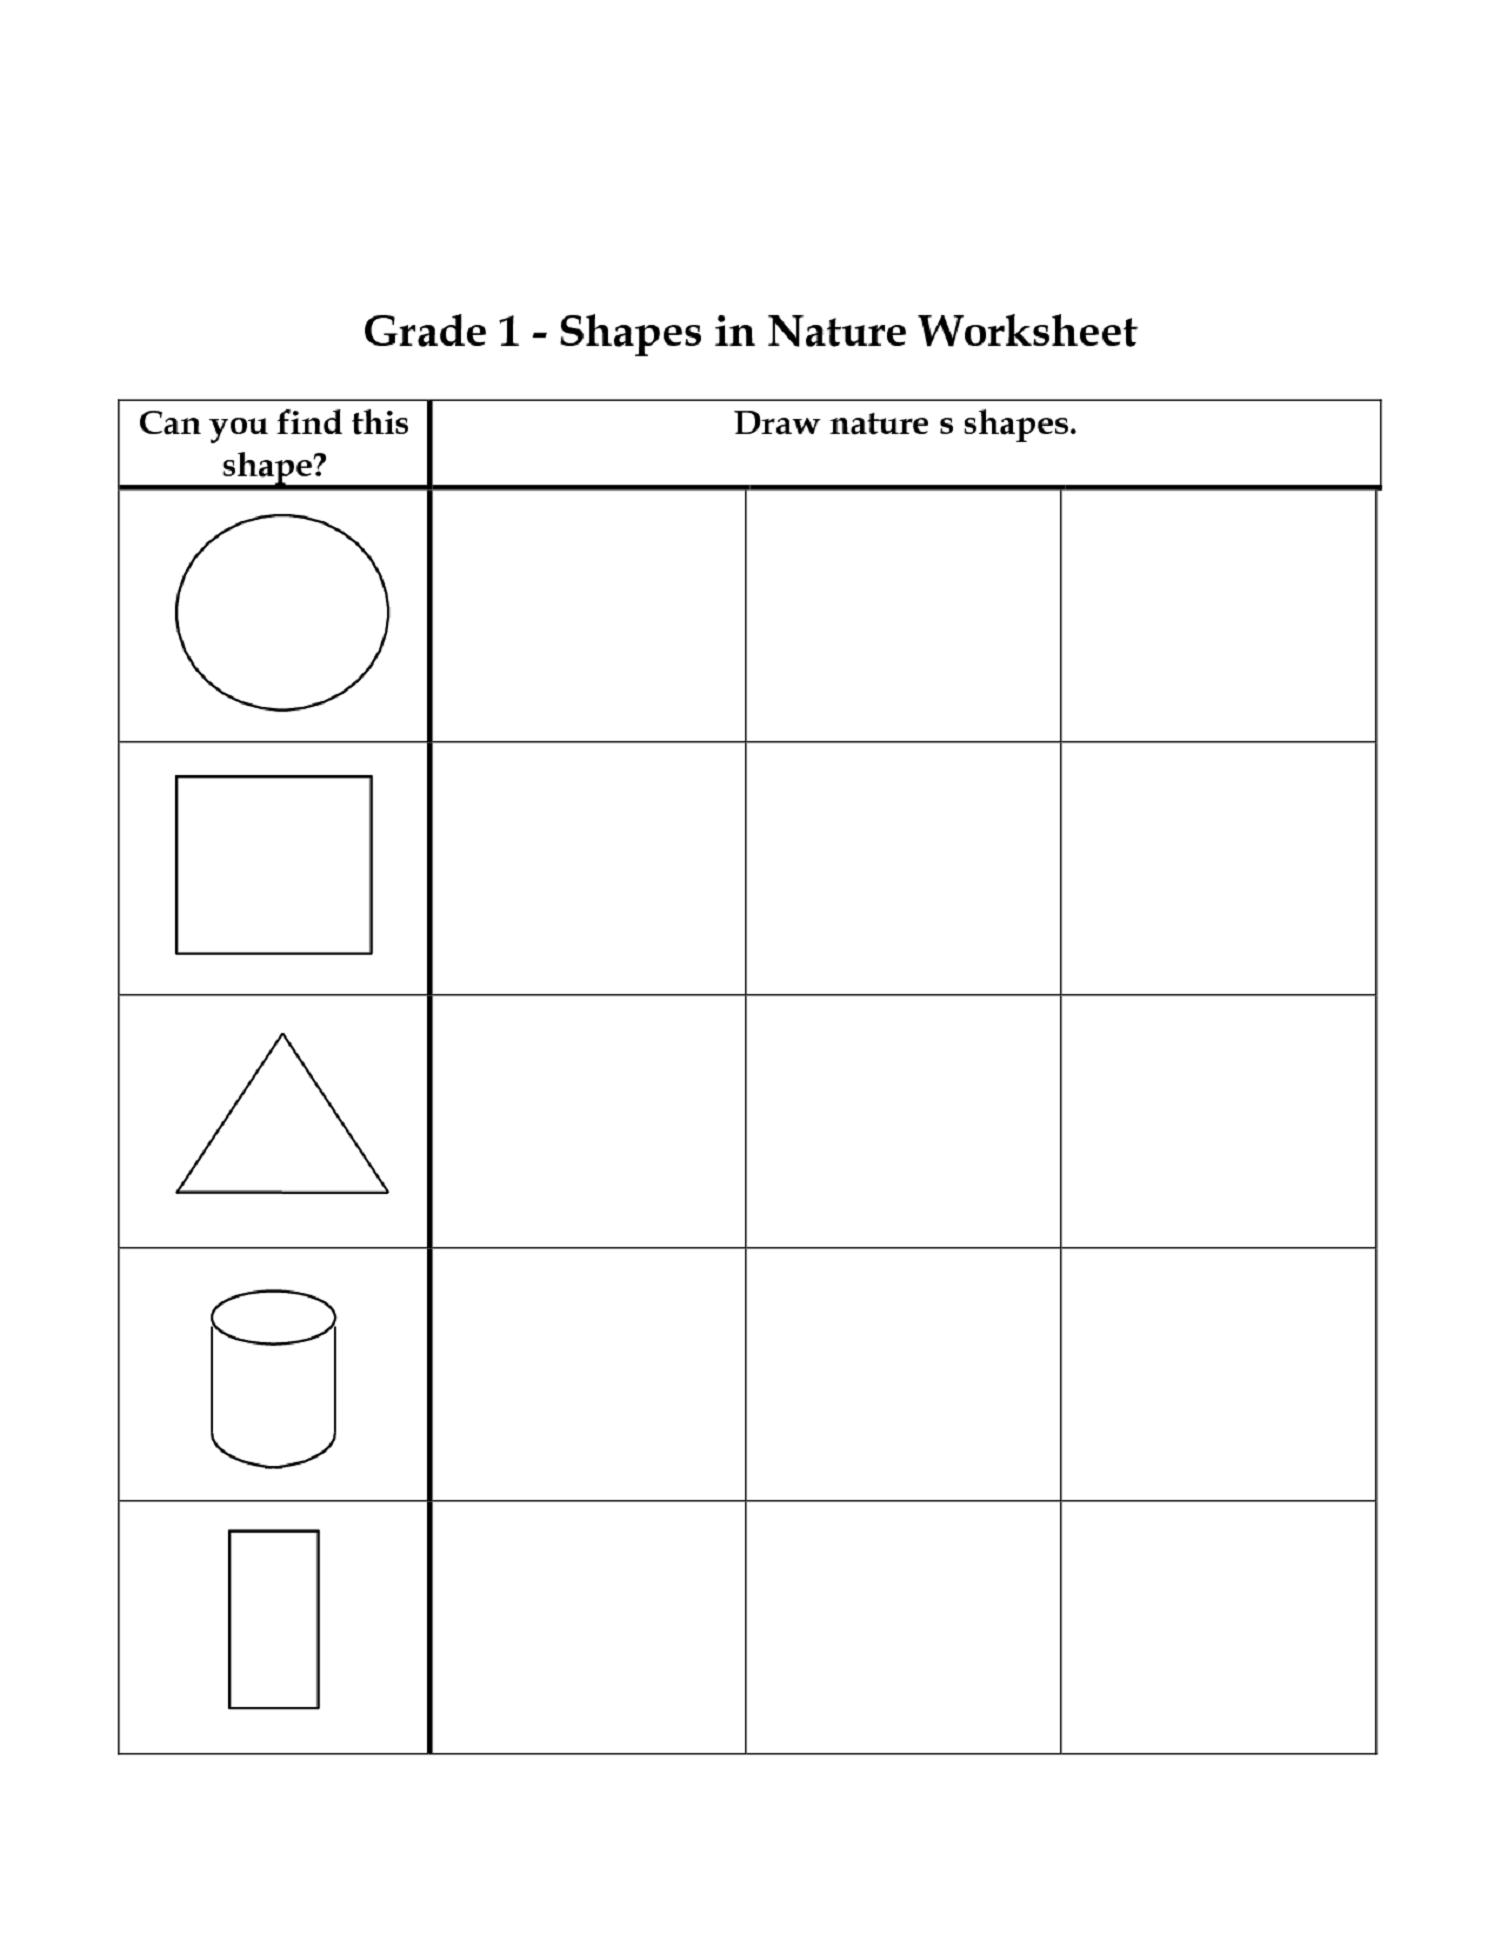 worksheets for grade 1 fun free printable math worksheets for 1st grade fun loving for 1 fun worksheets grade